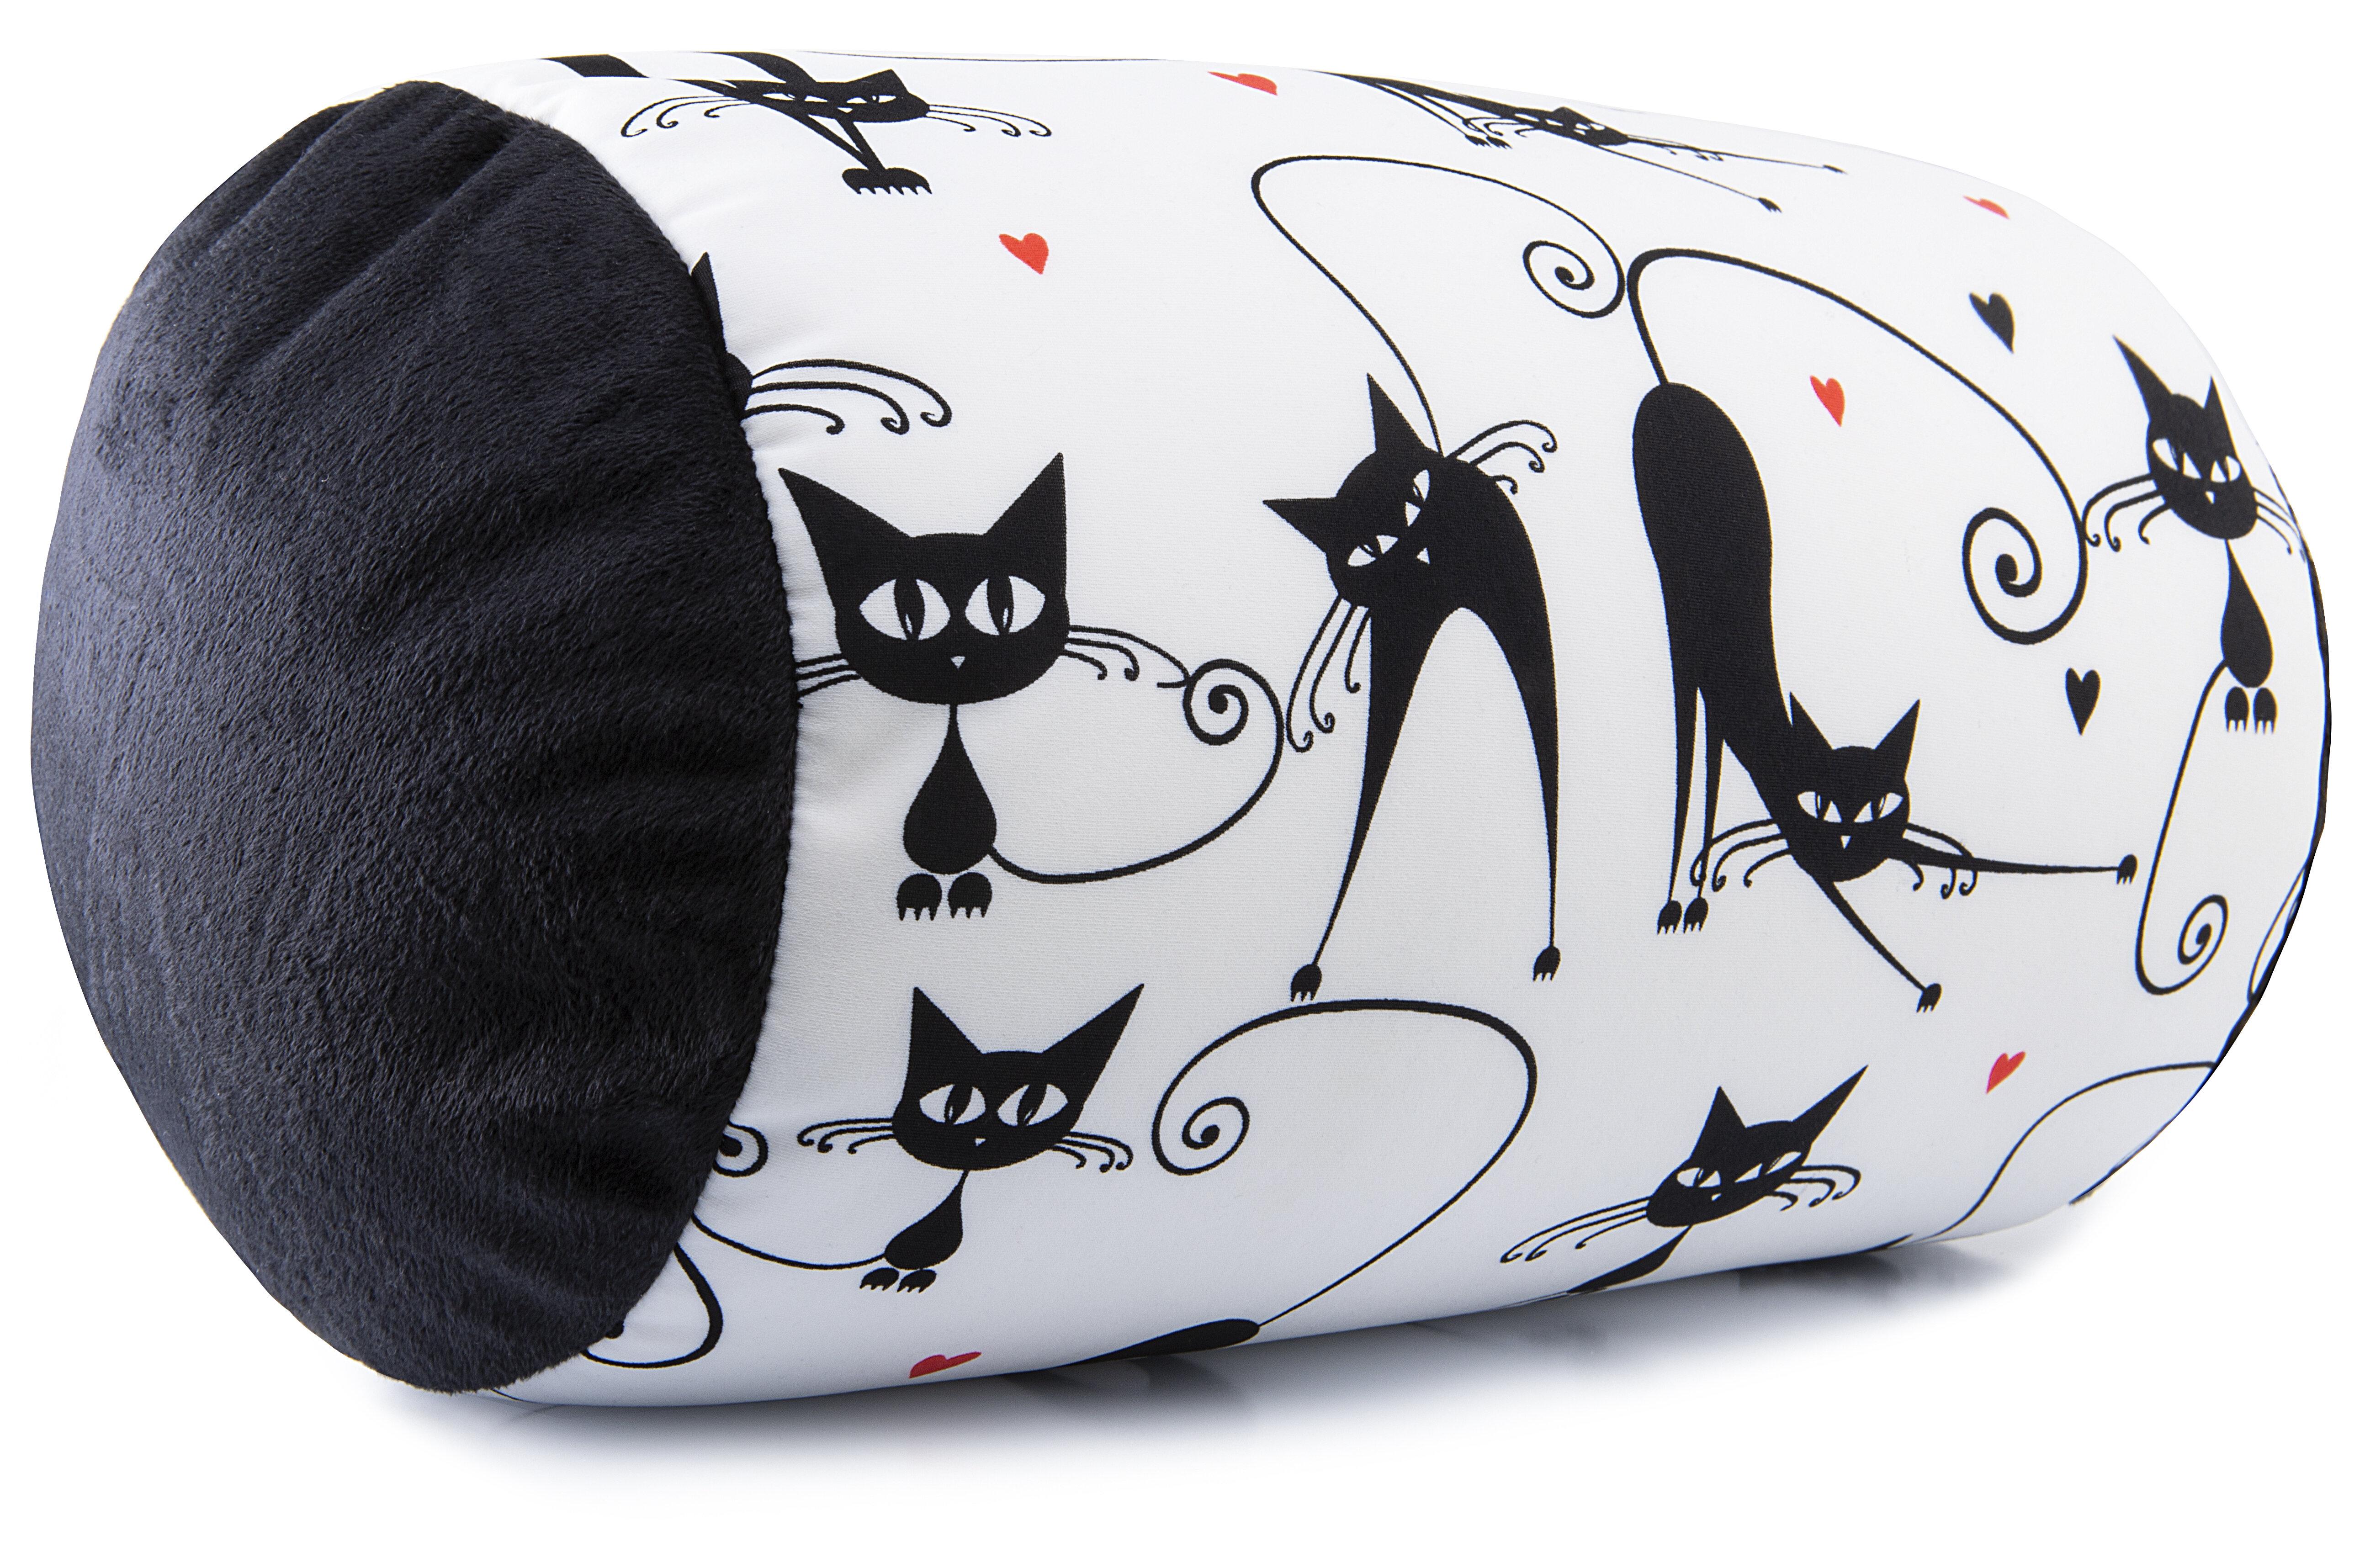 Astonishing Dacheng Squish Microbead Bolster Pillow Creativecarmelina Interior Chair Design Creativecarmelinacom